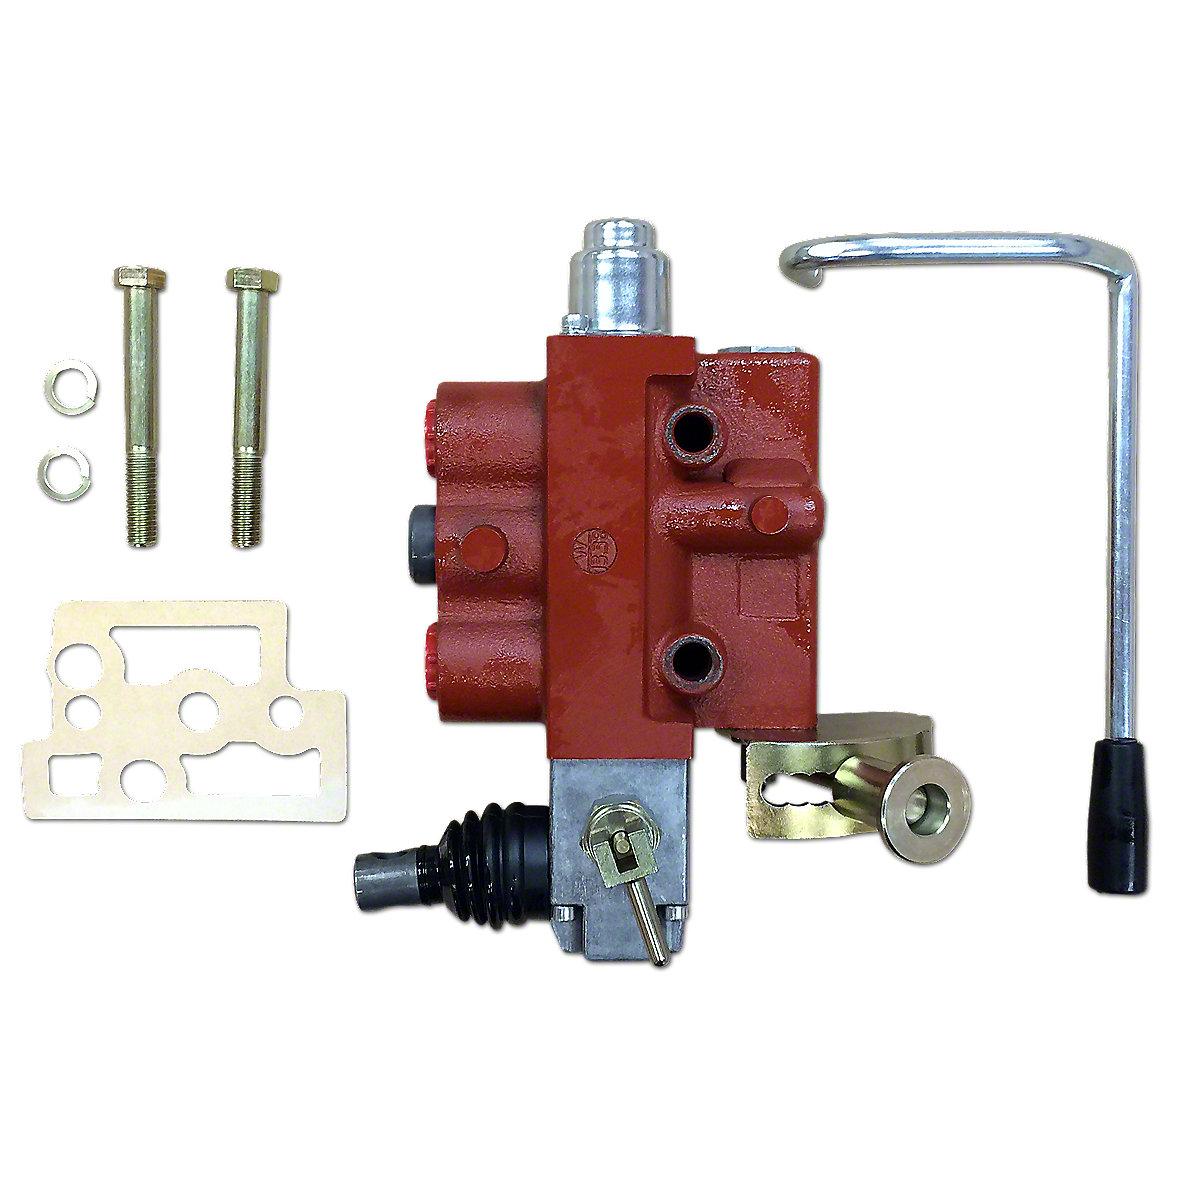 Tractor Hydraulic Remote : Mfs single hydraulic remote valve